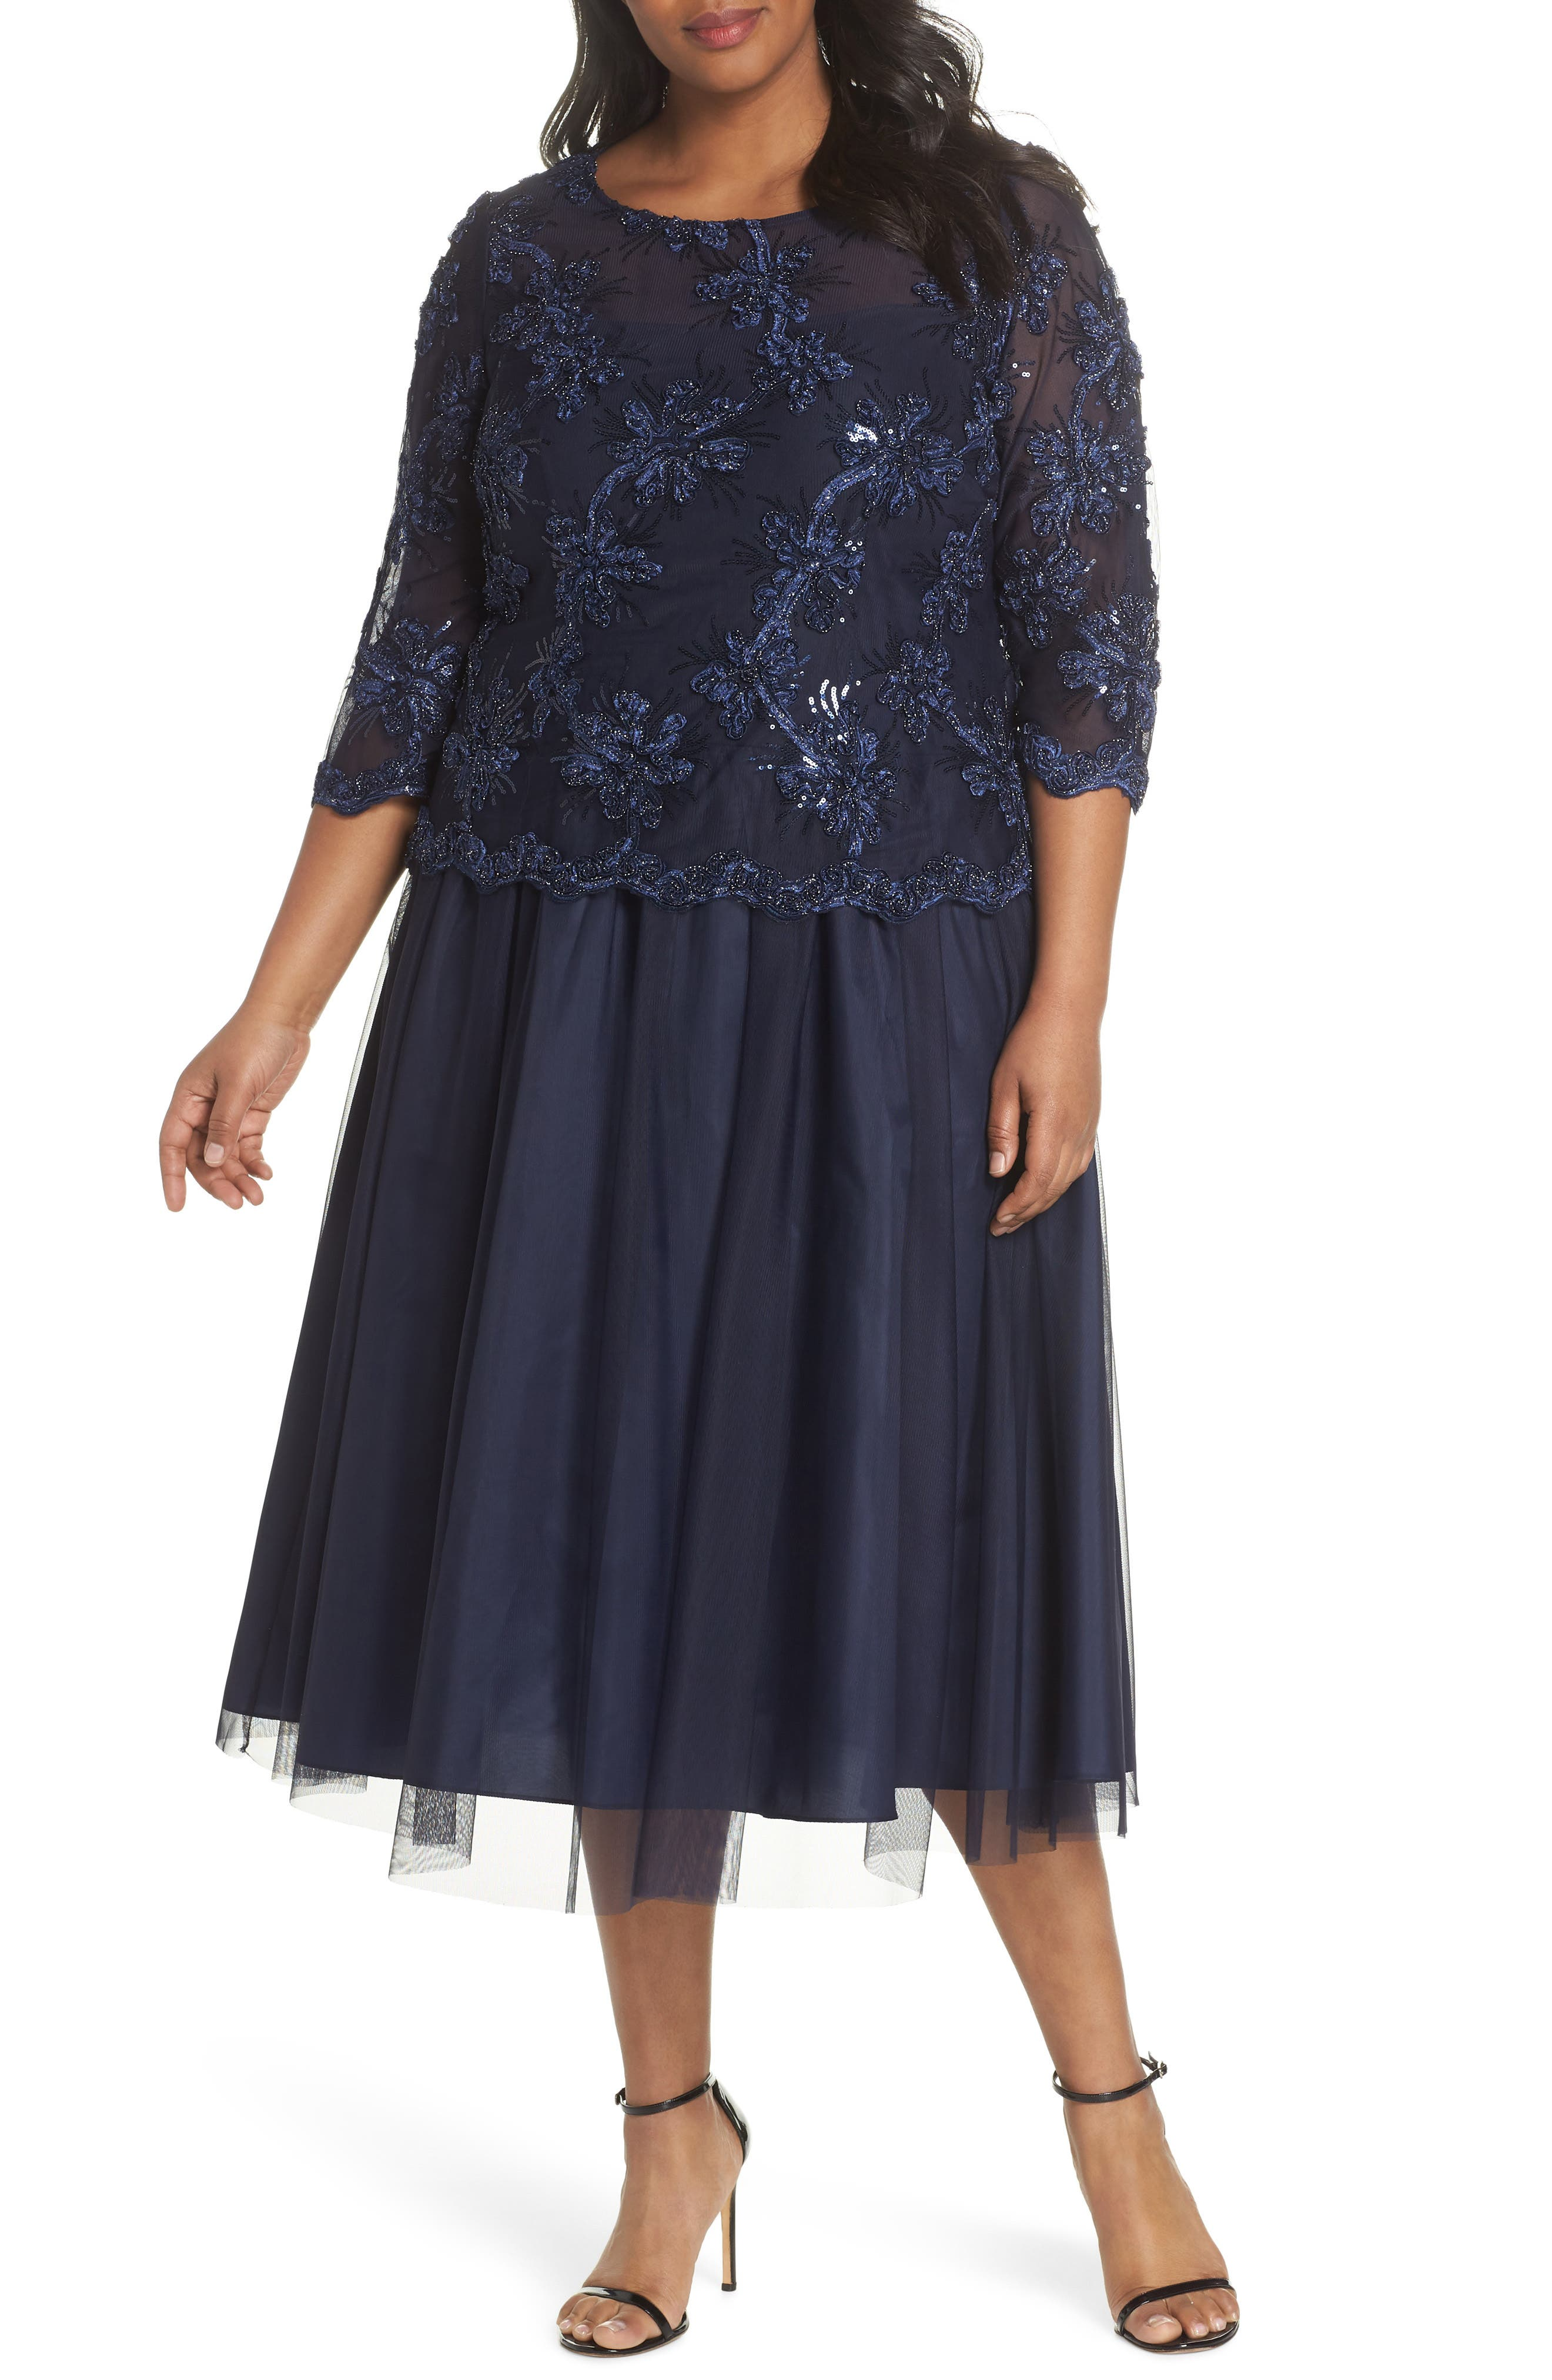 Alex Evenings Embellished Bodice Tea Length Mesh Dress (Plus Size)